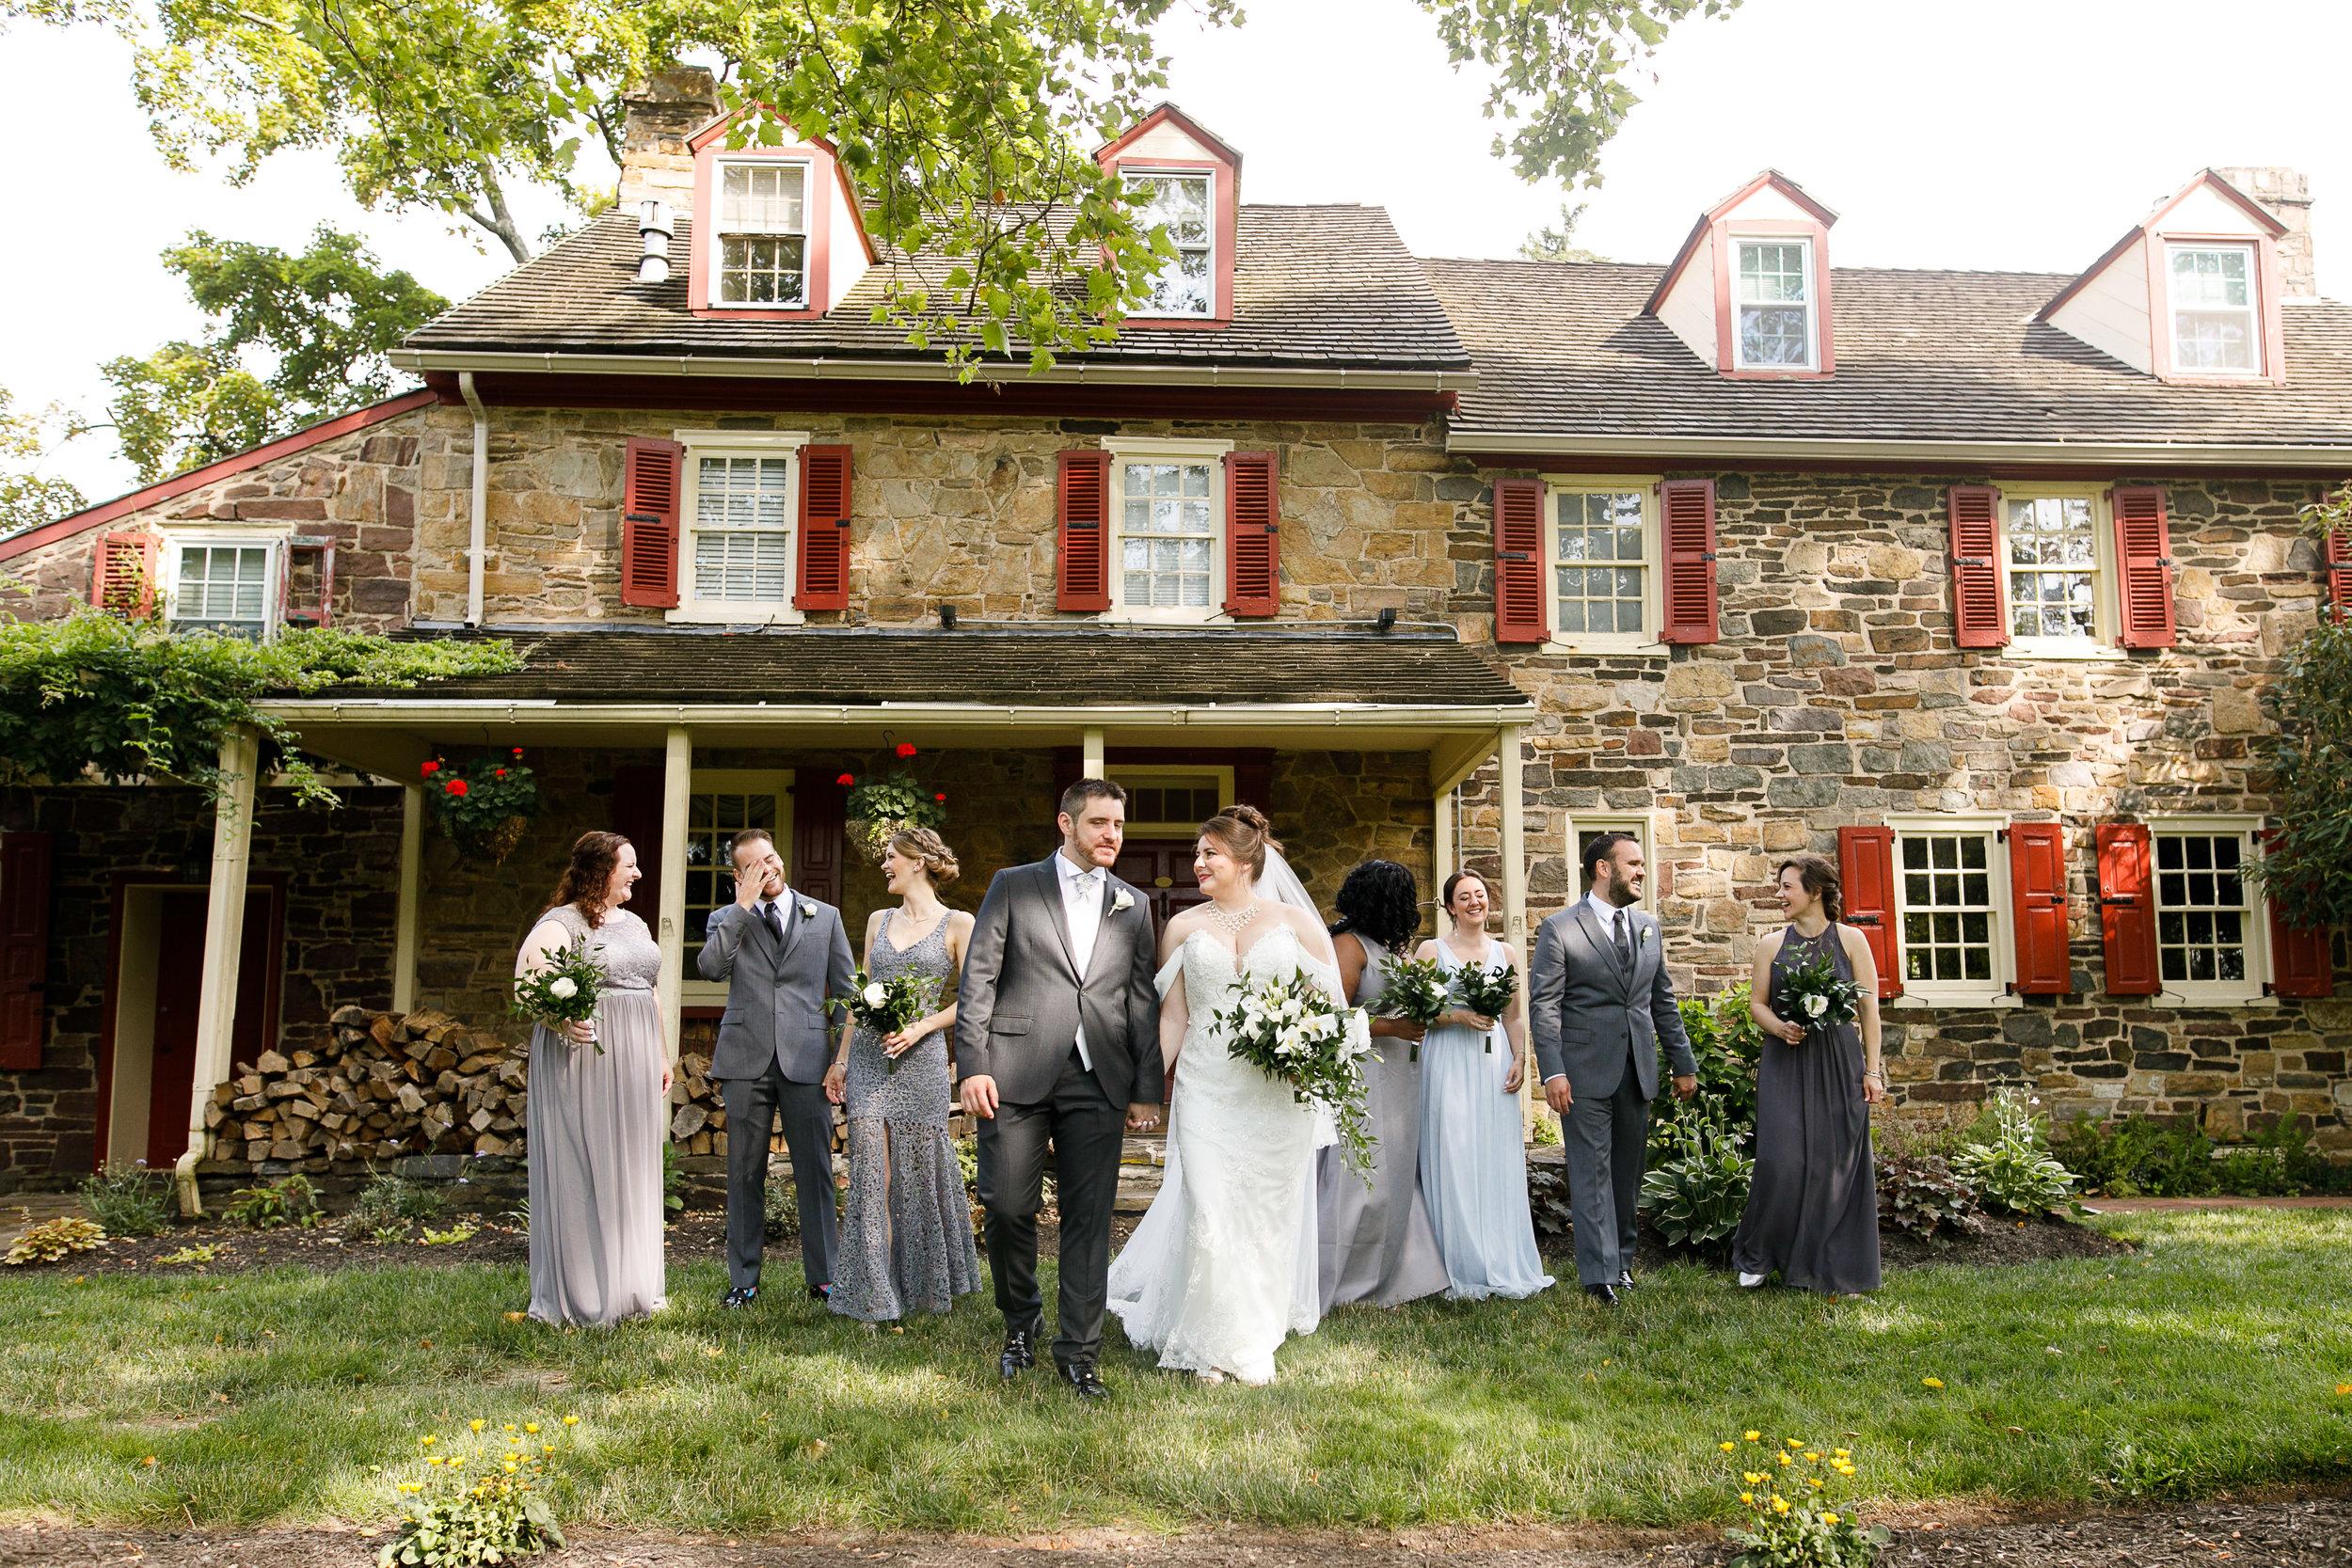 Wedding at Joseph Ambler In Bucks County PA17.jpg